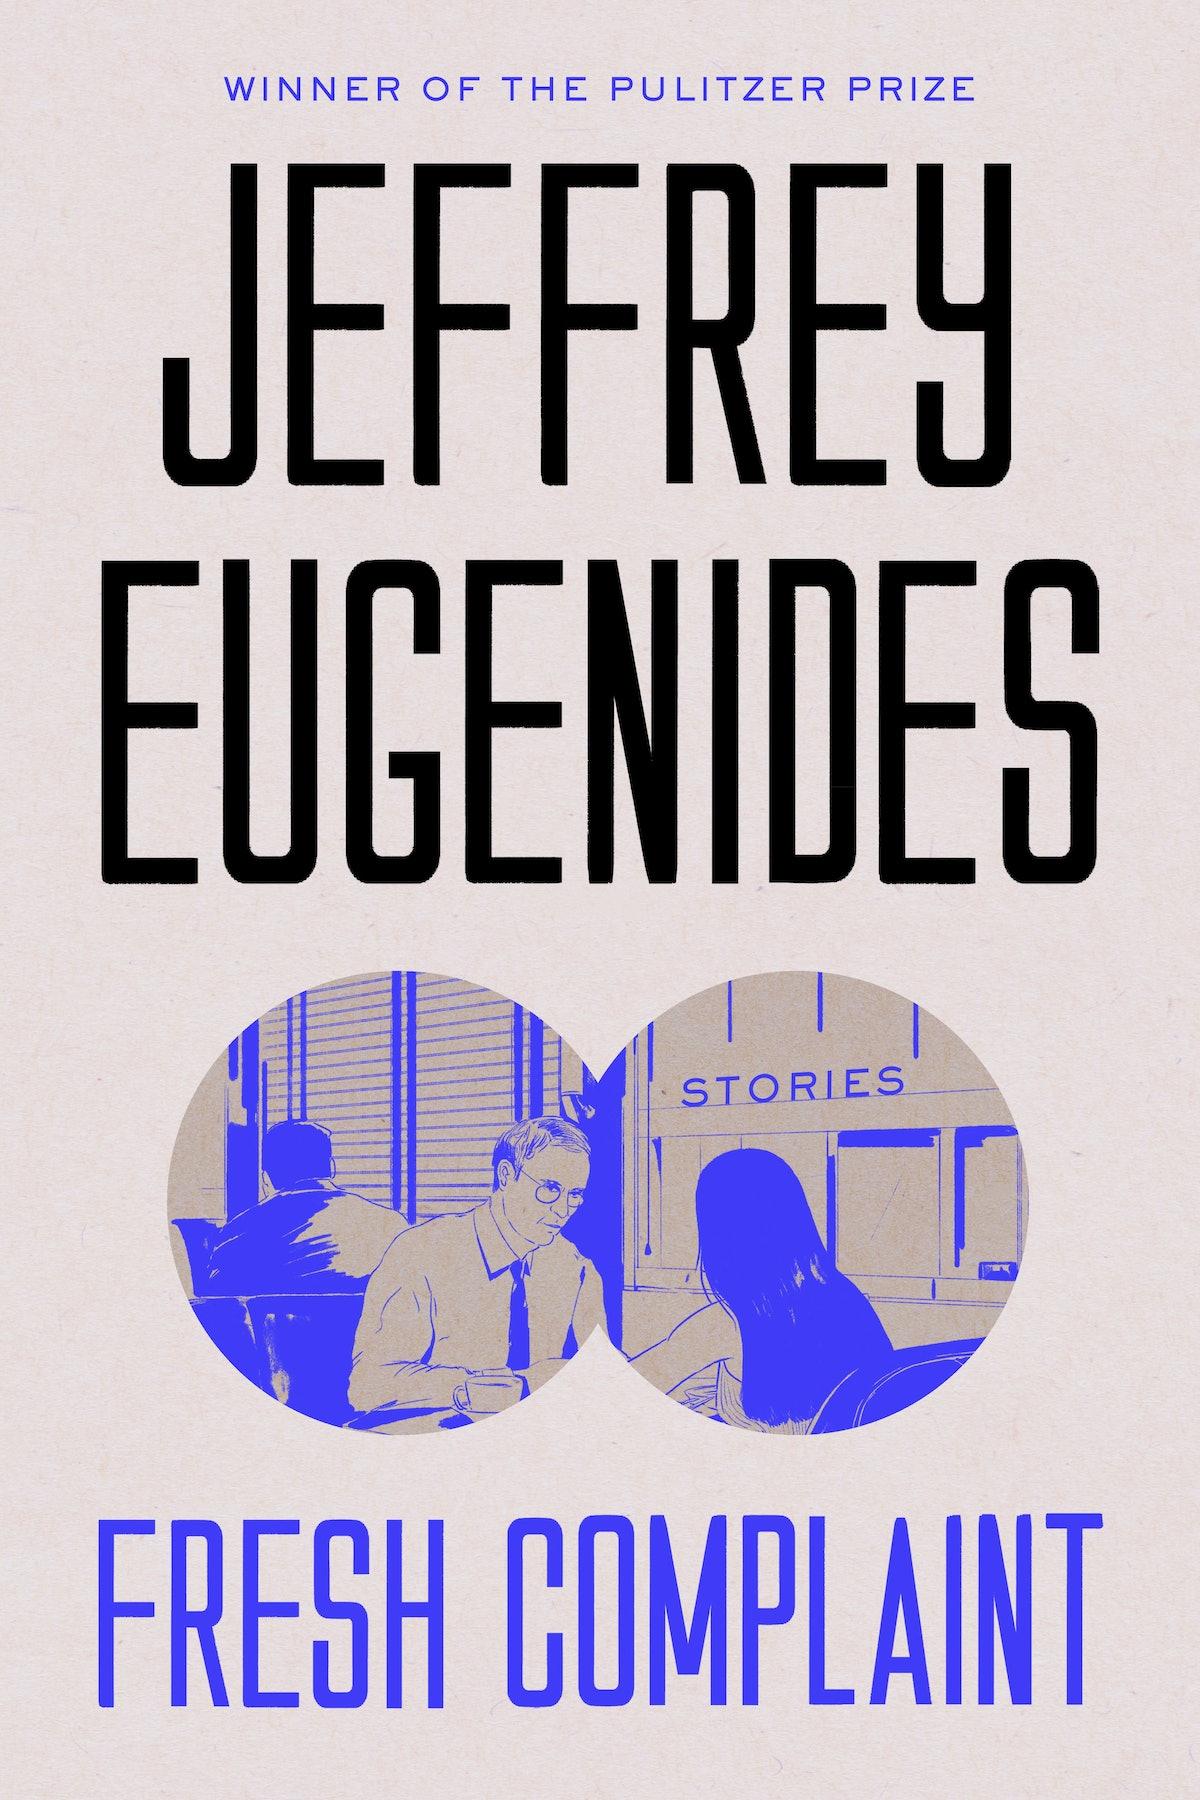 Jeffrey Eugenides - Fresh Complaint.JPG